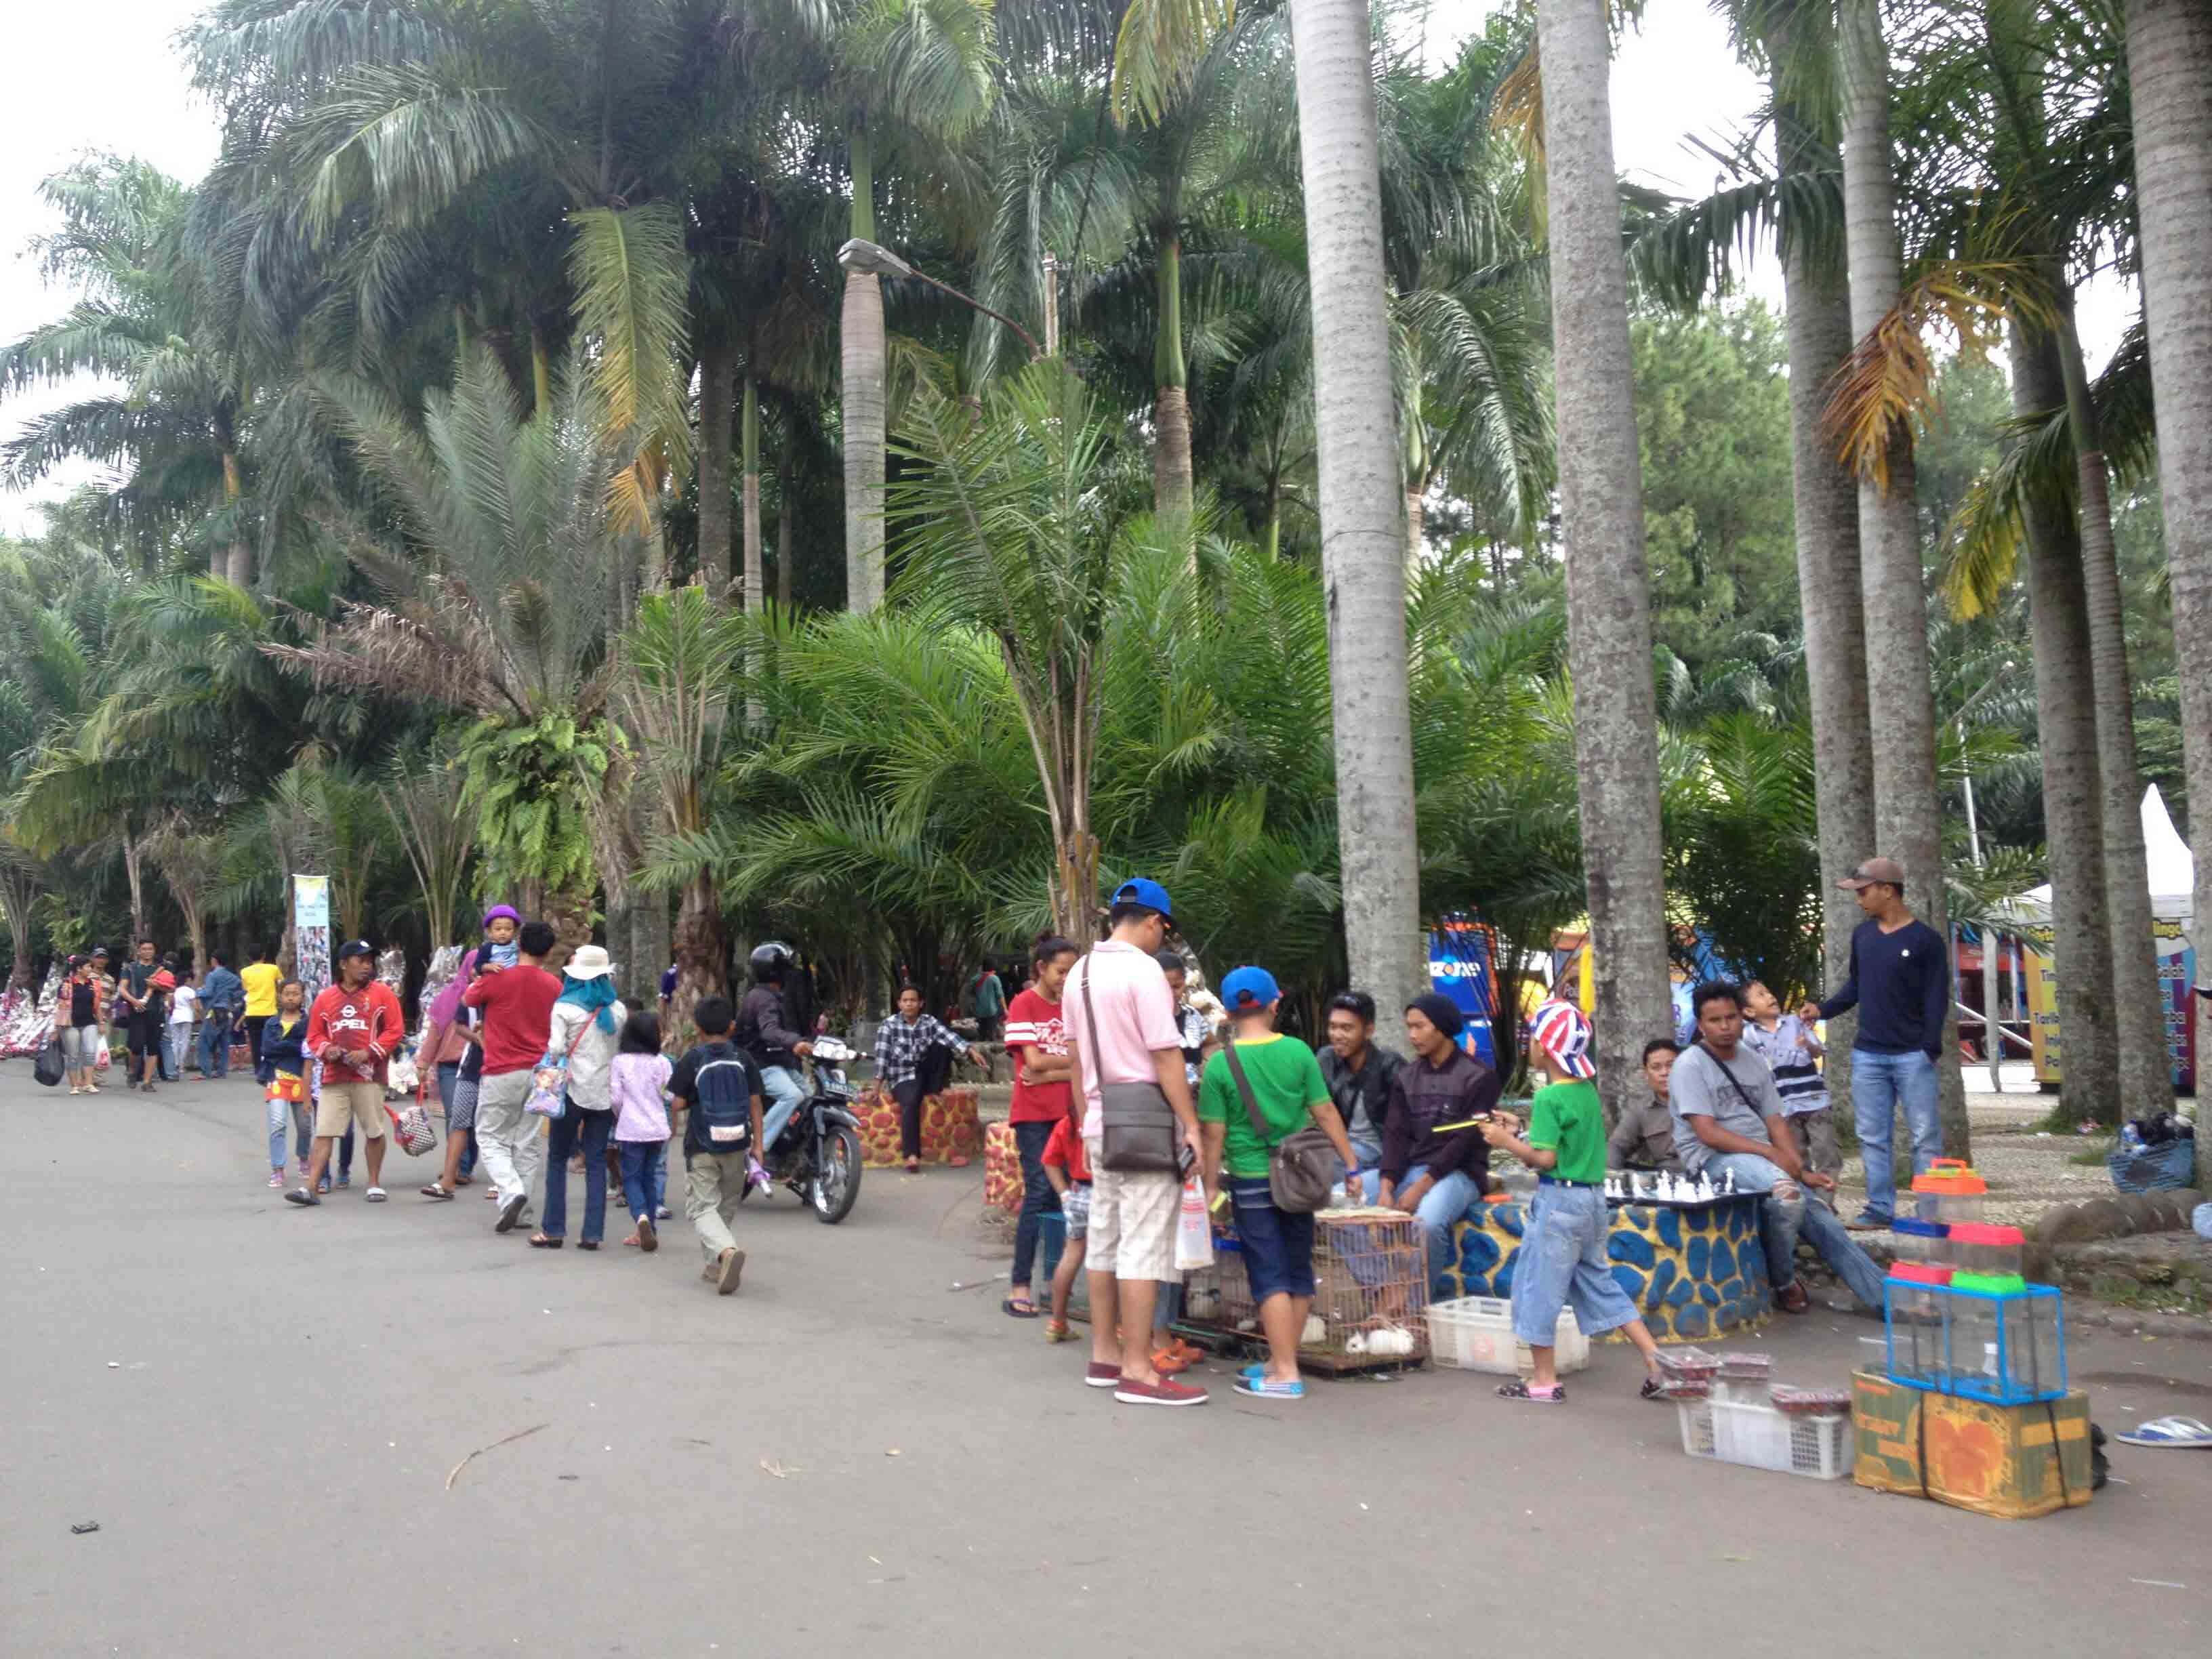 Liburan Wisata Camplong Dipadati Pengunjung Poskota News Taman Matahari Ramai